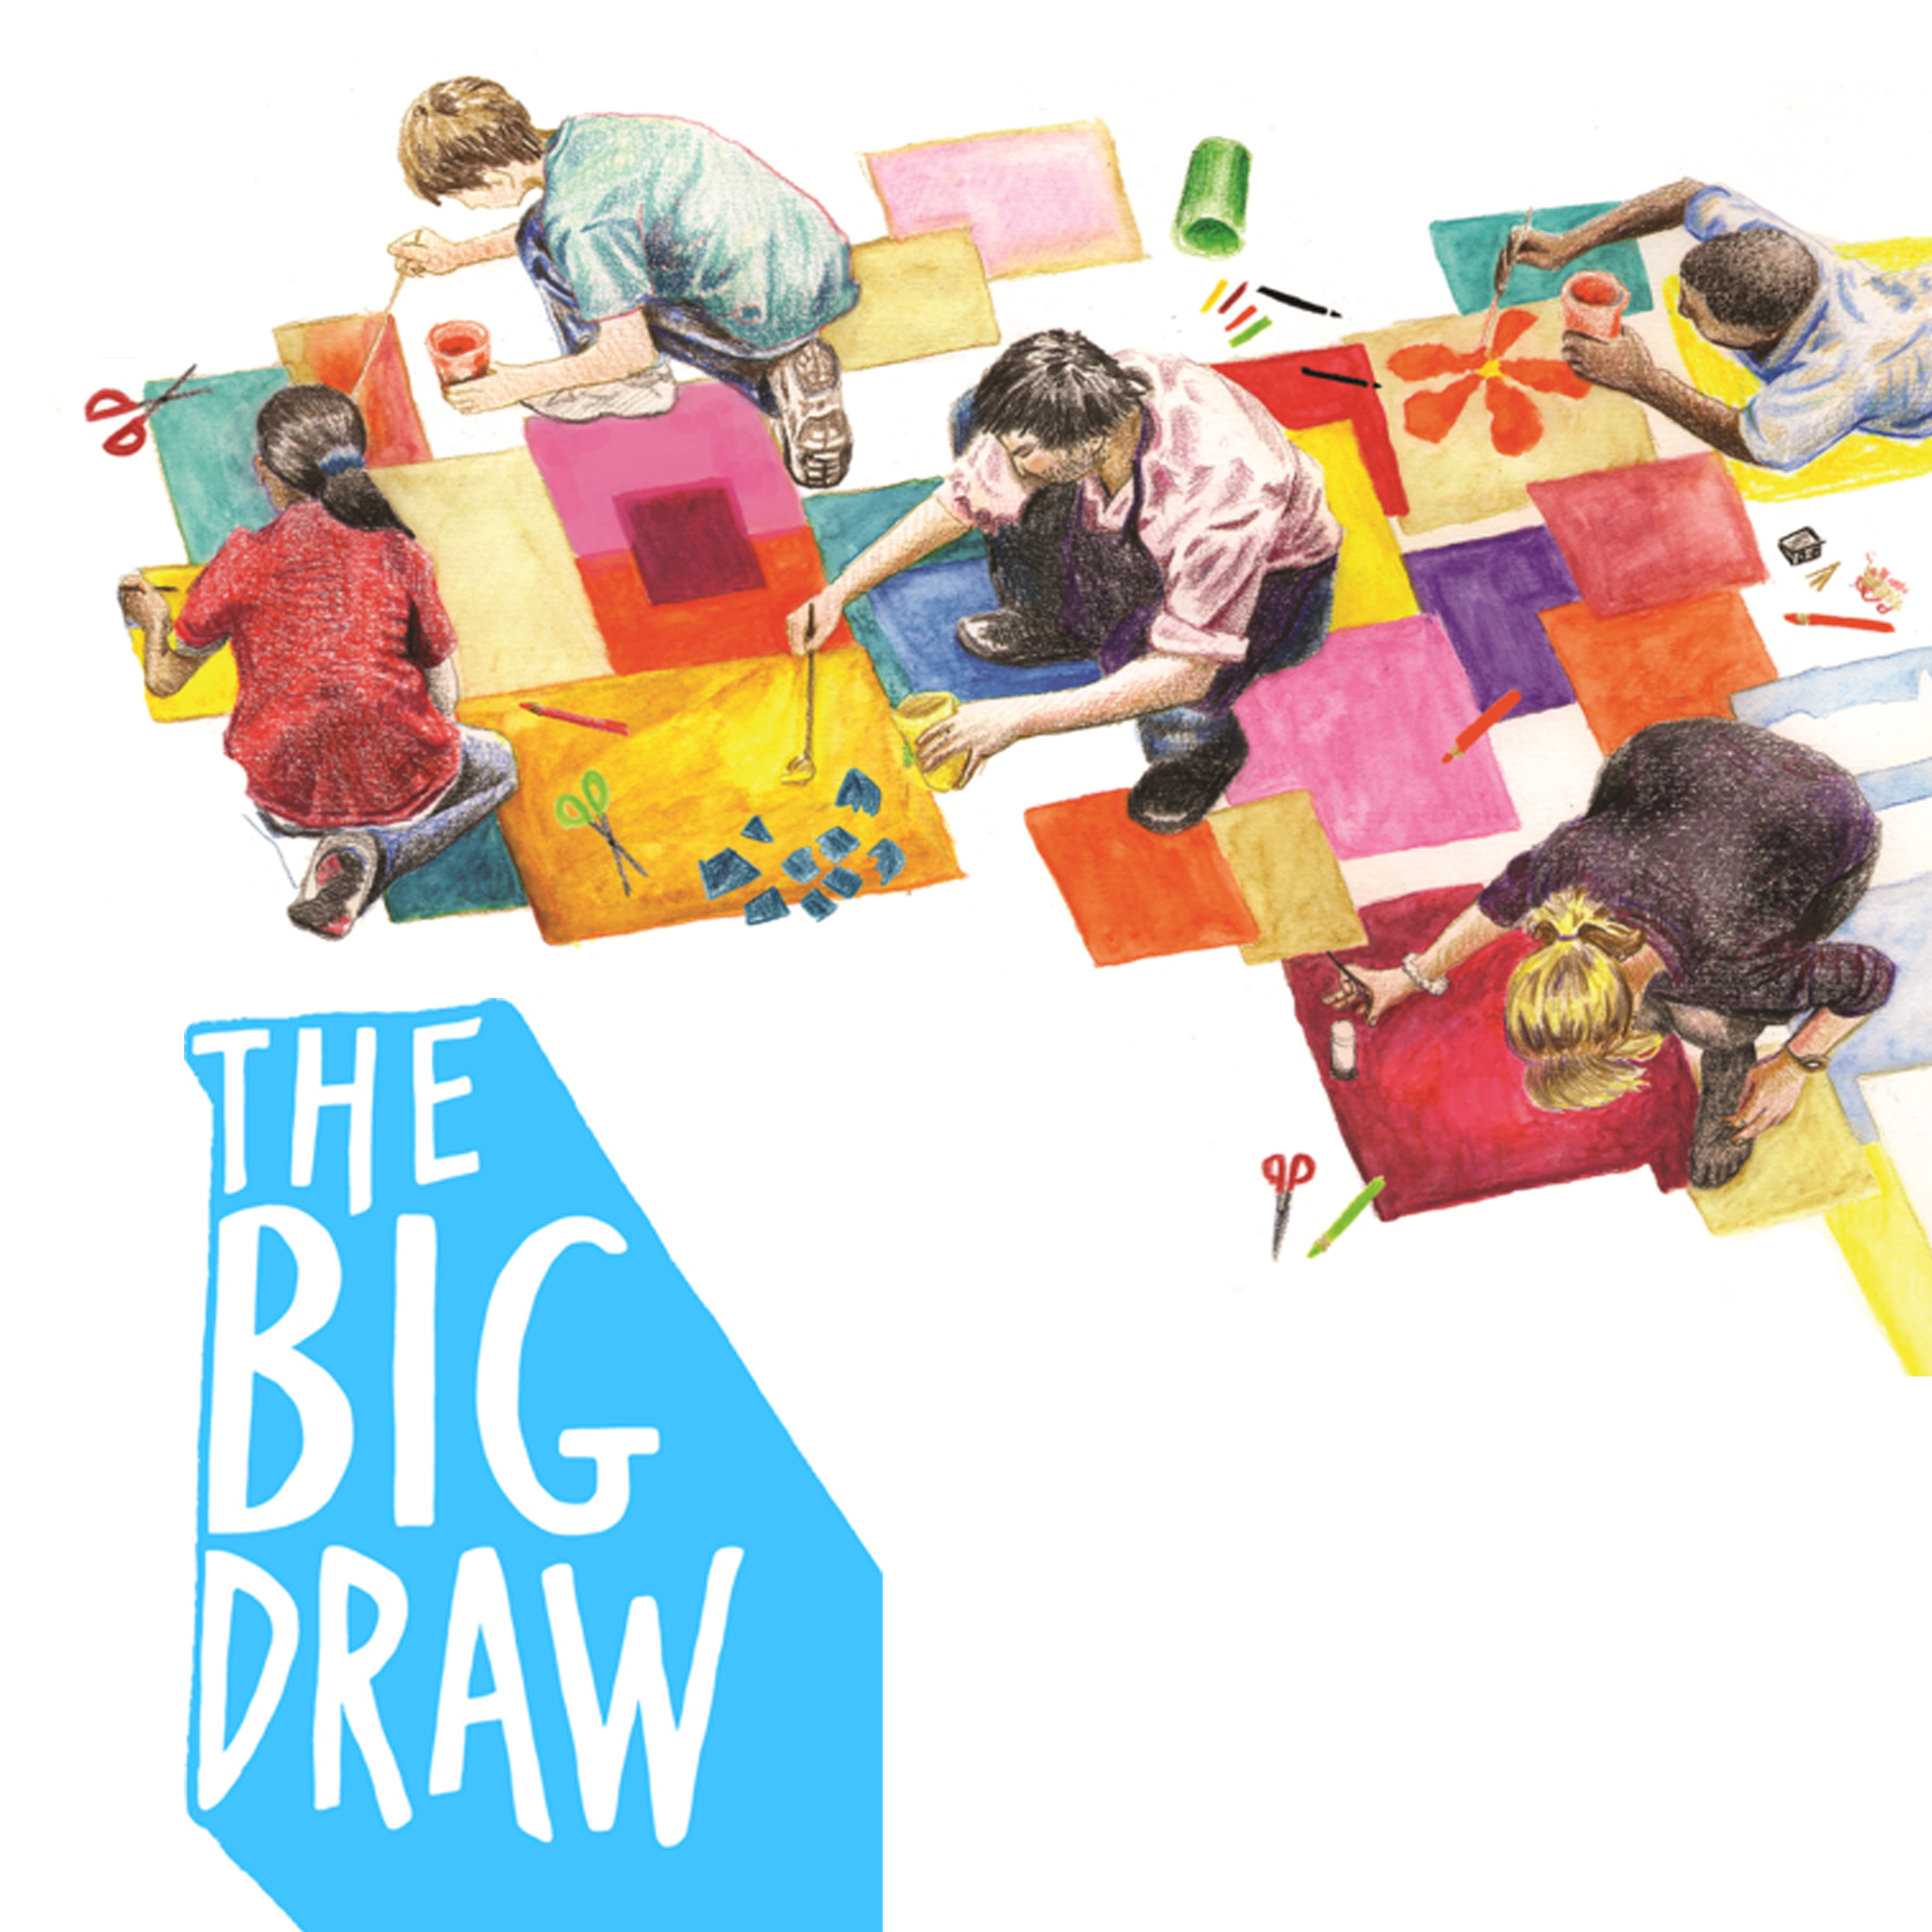 The Big Draw!